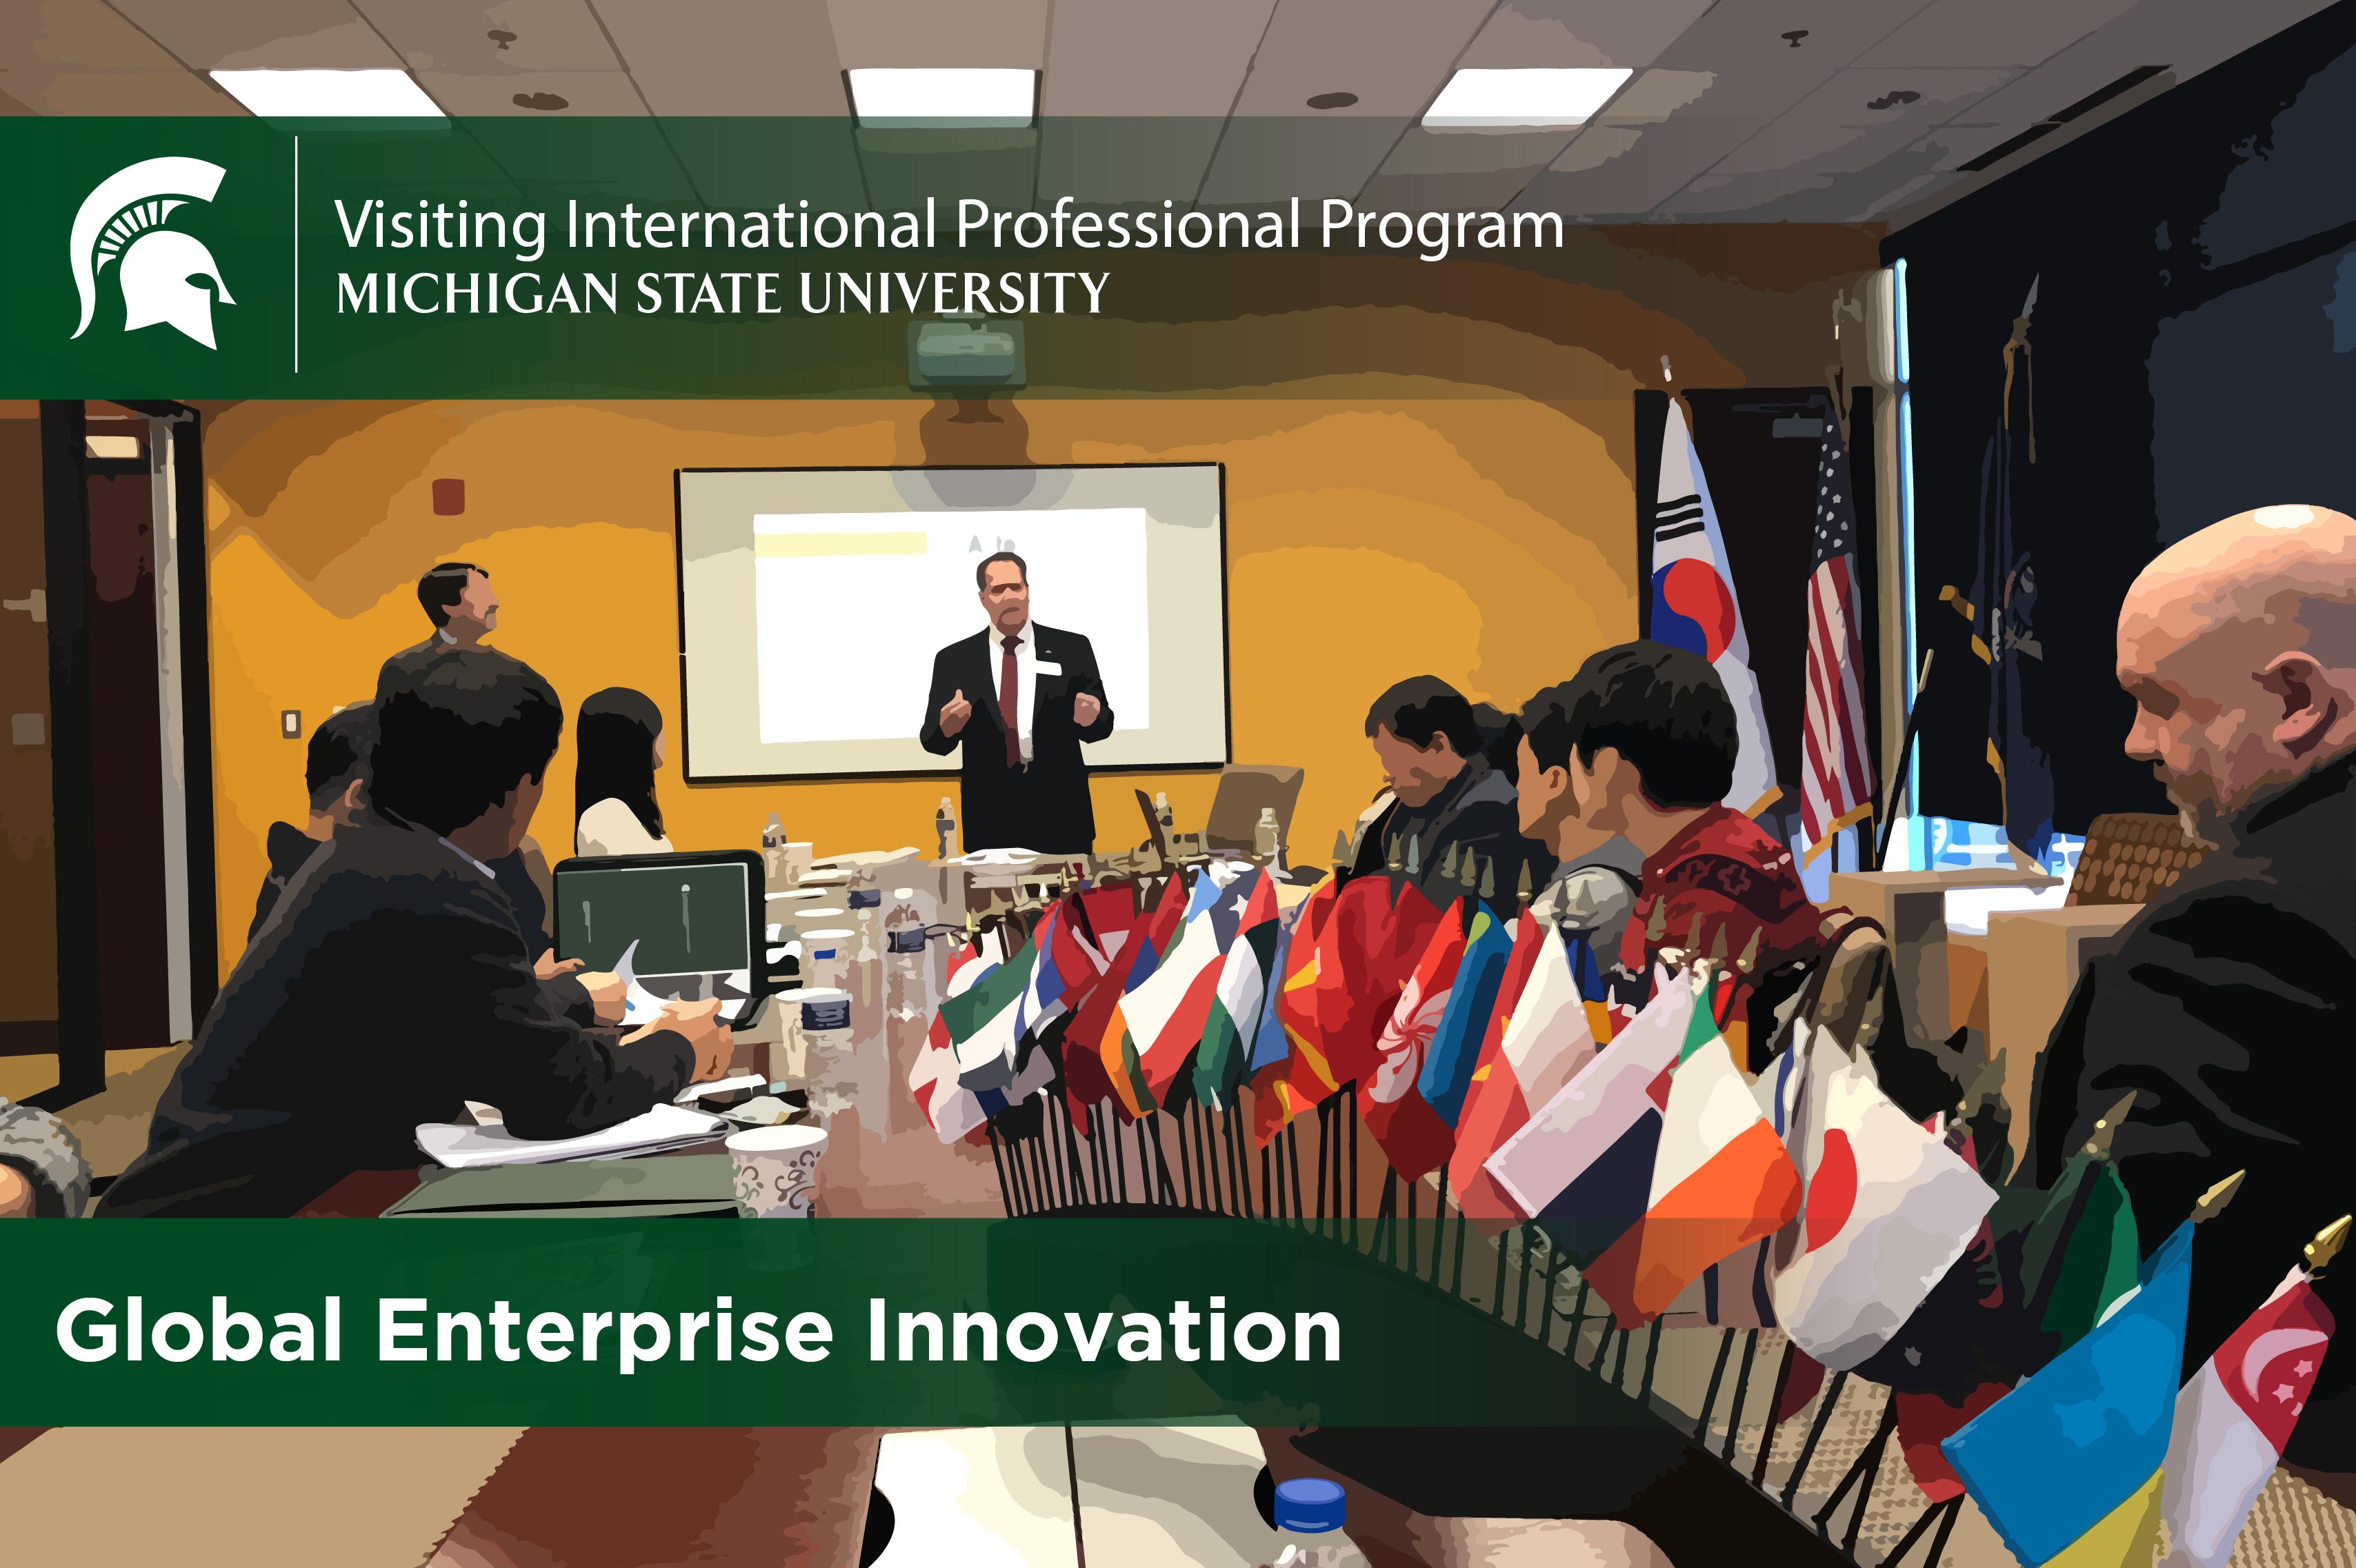 Visiting International Professional Program Global Summer School